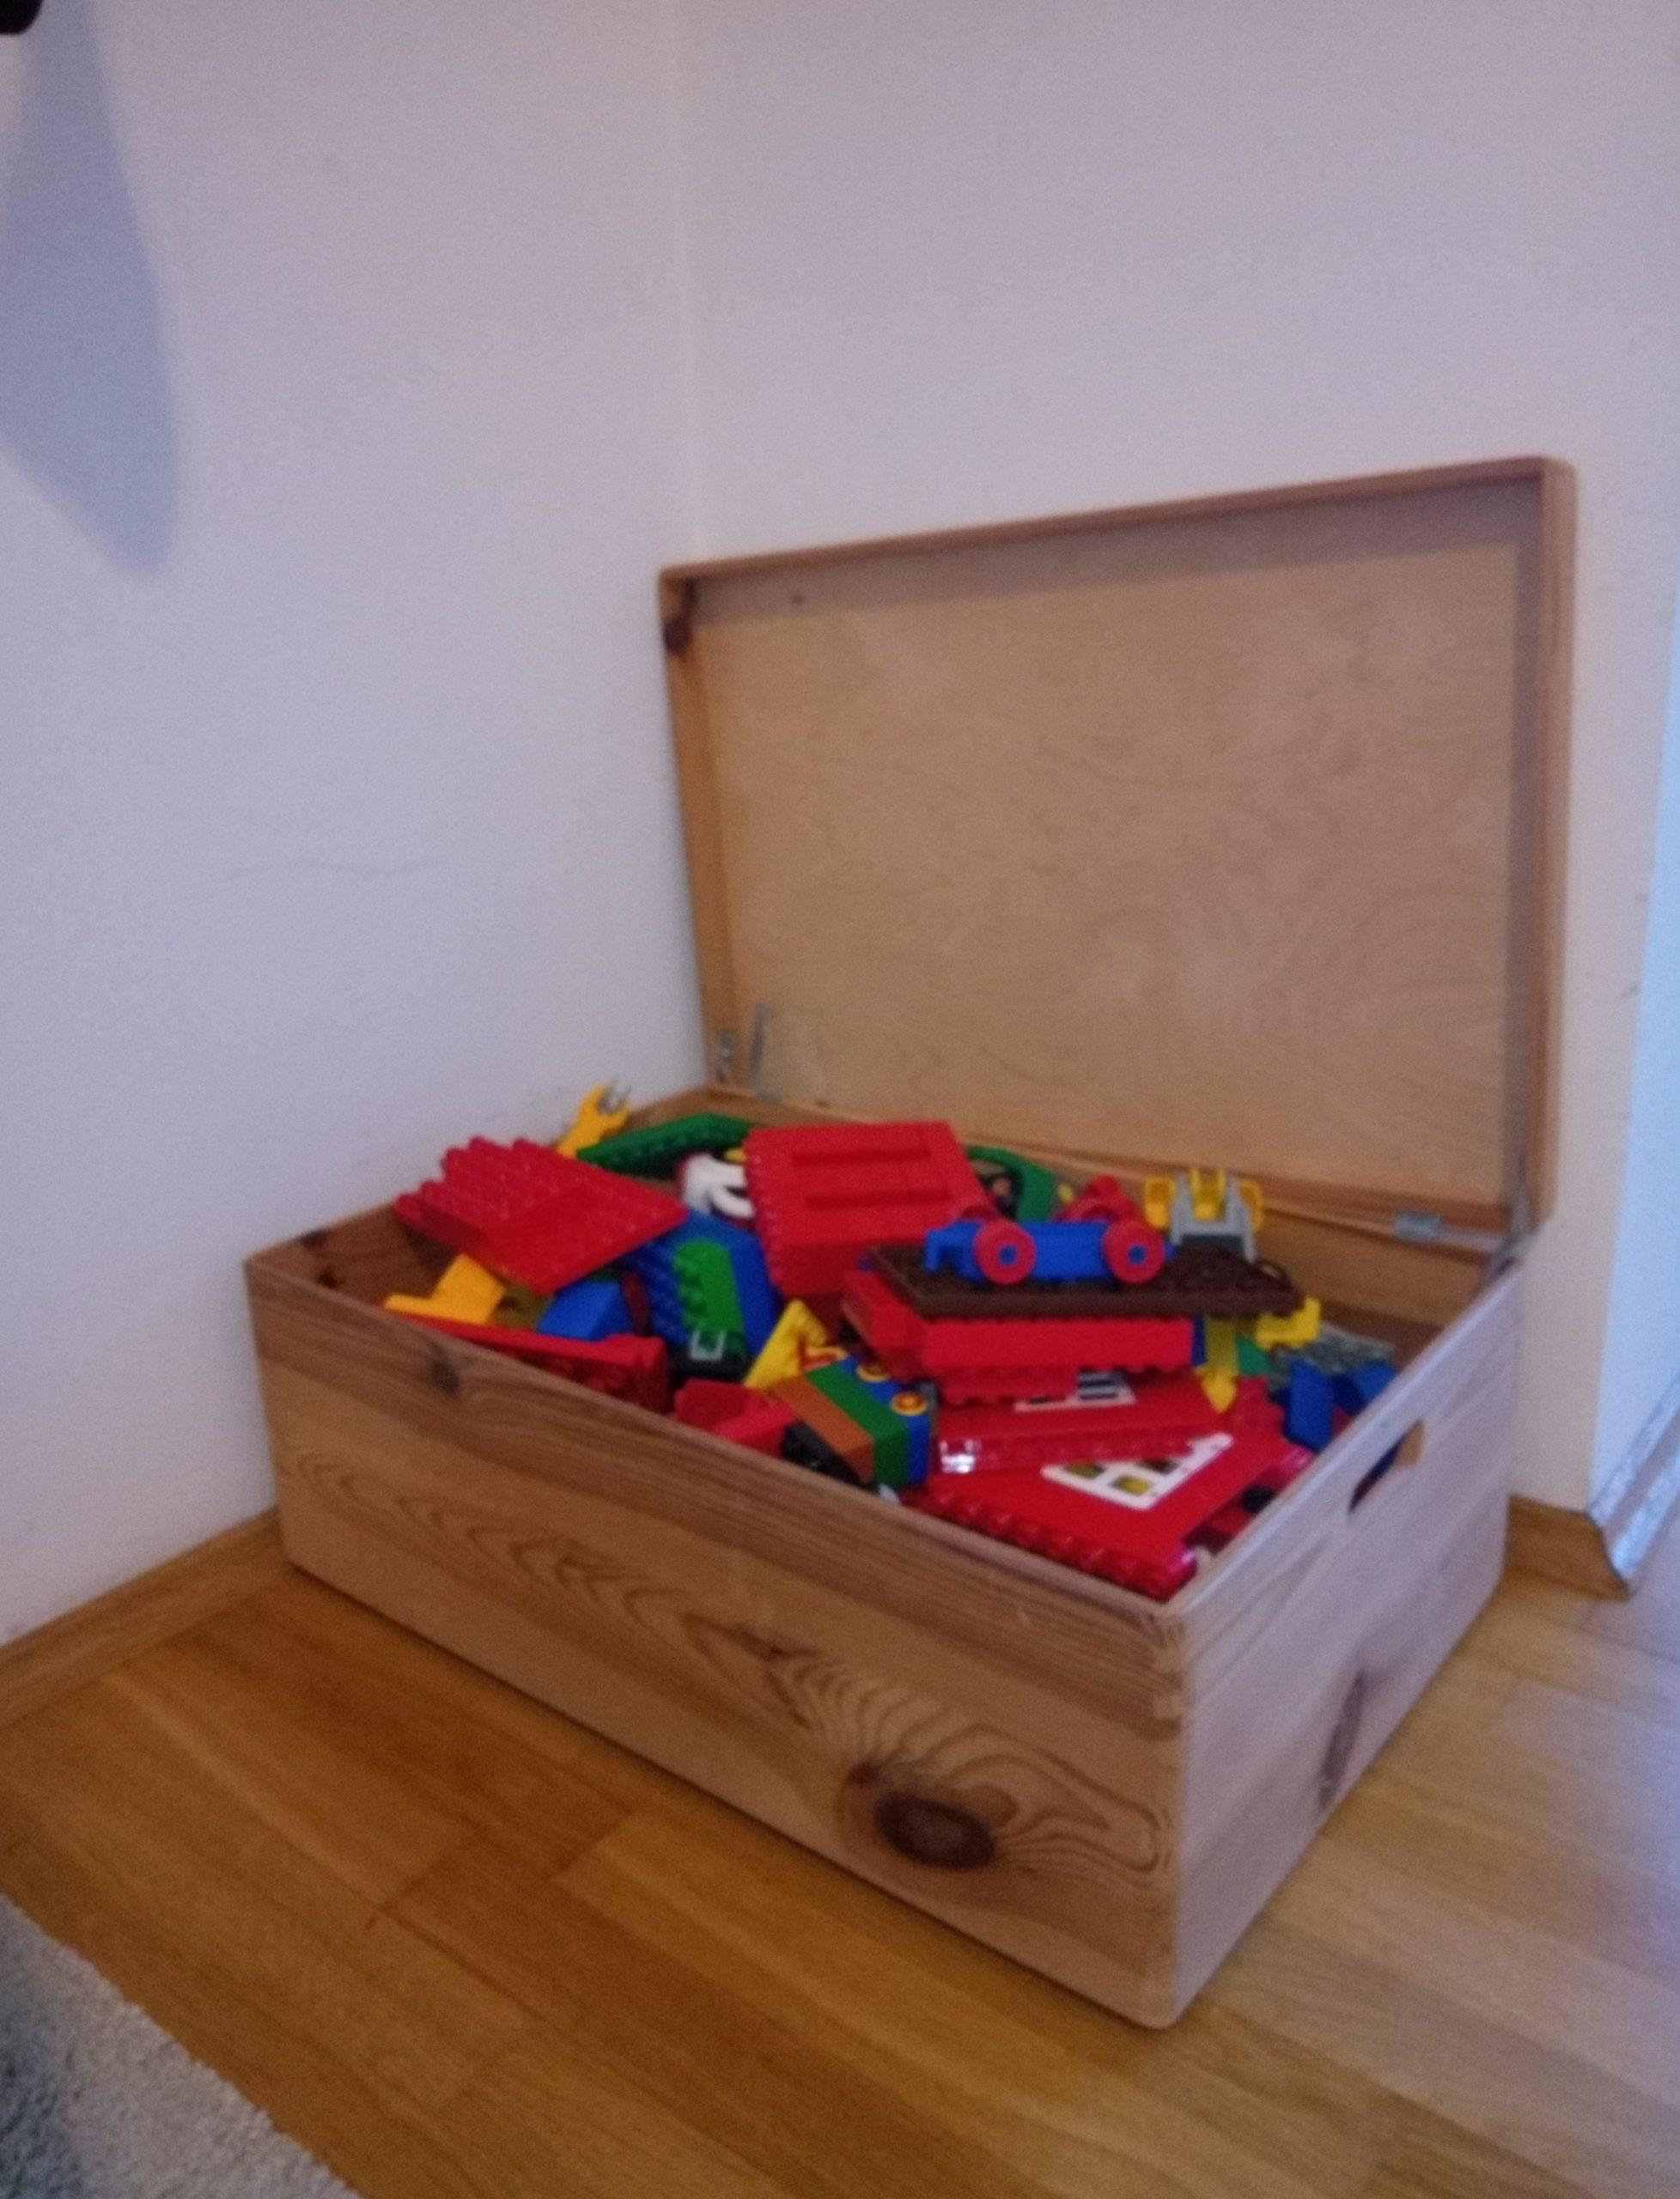 Minimalismus: Spielzeug